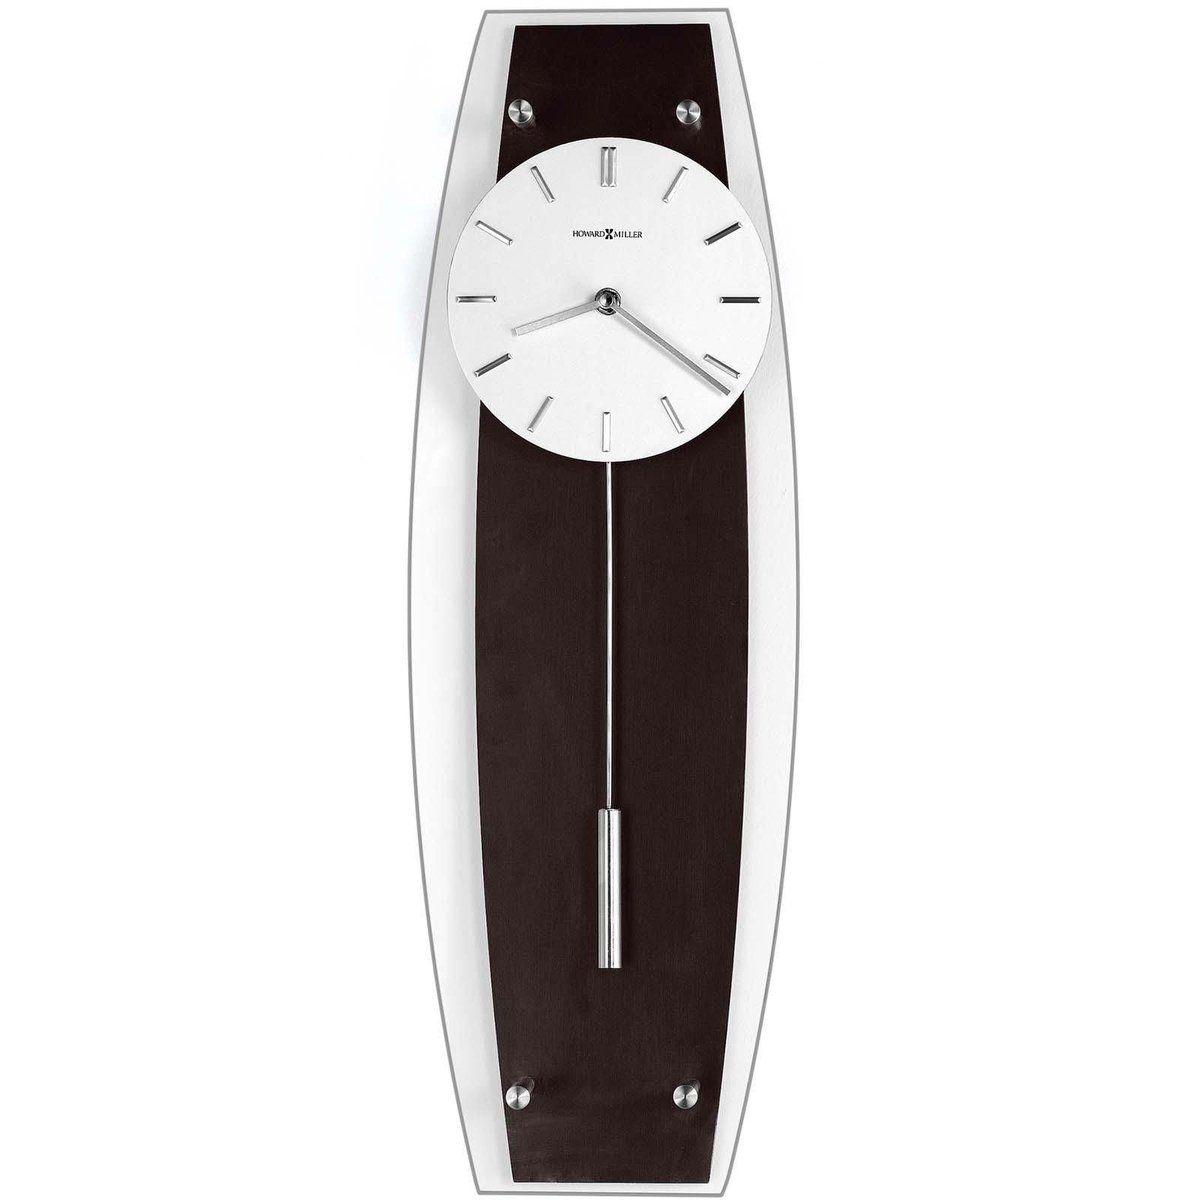 Howard Miller 625 401 Cyrus Wall Clock Front Wall Clock Clock Contemporary Wall Clock